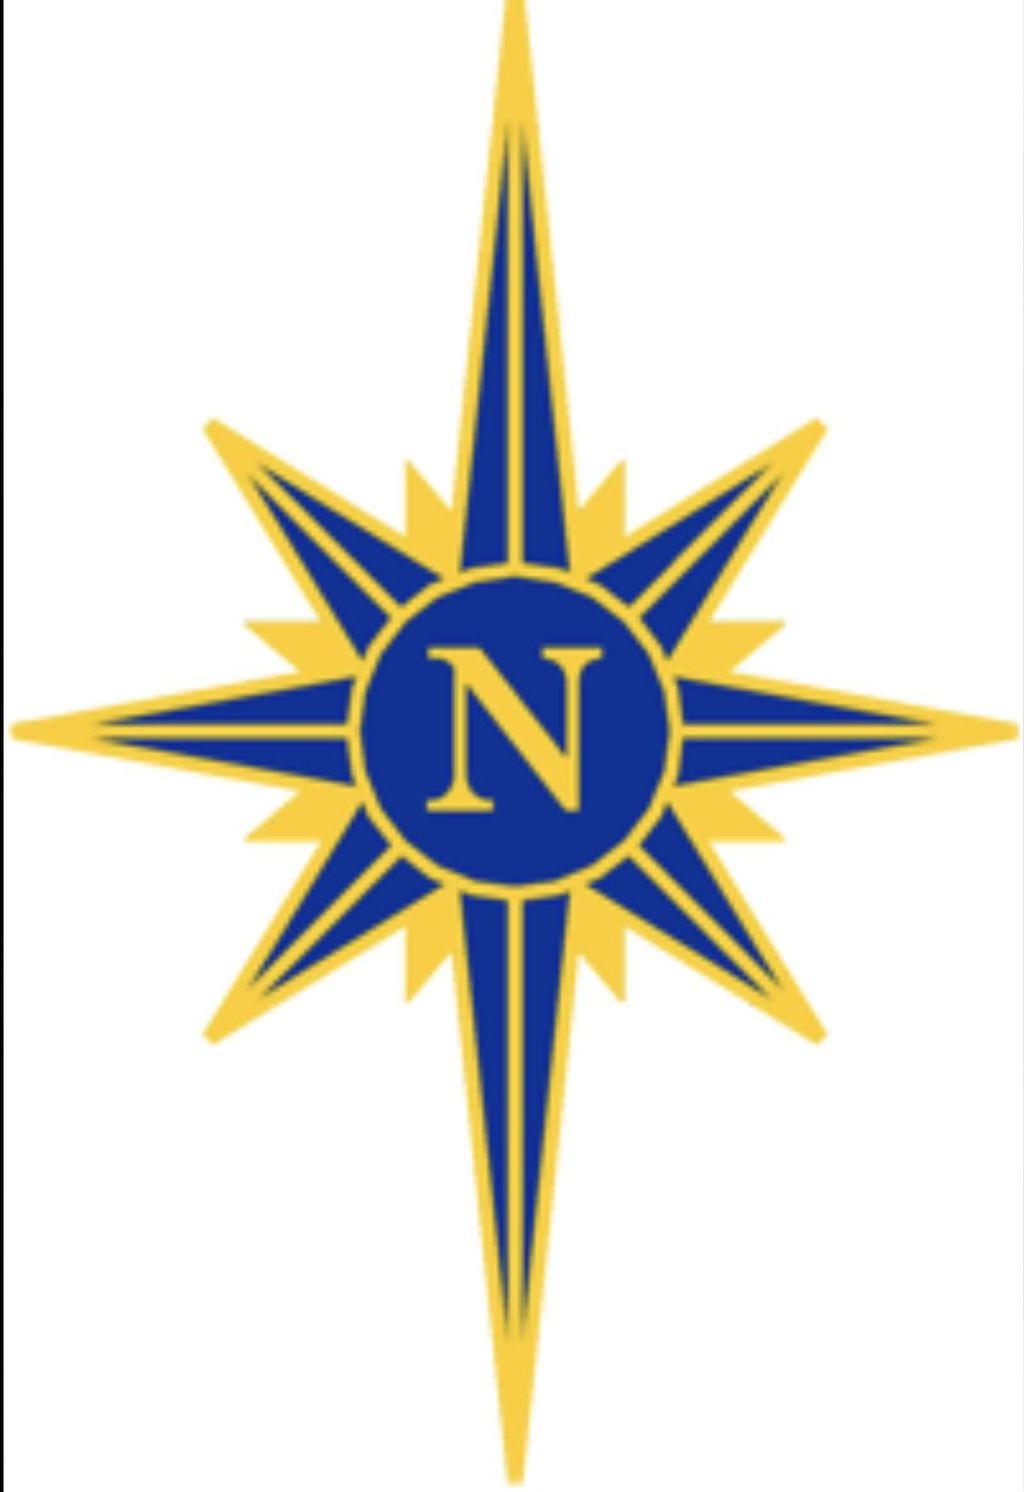 North Star Remodel